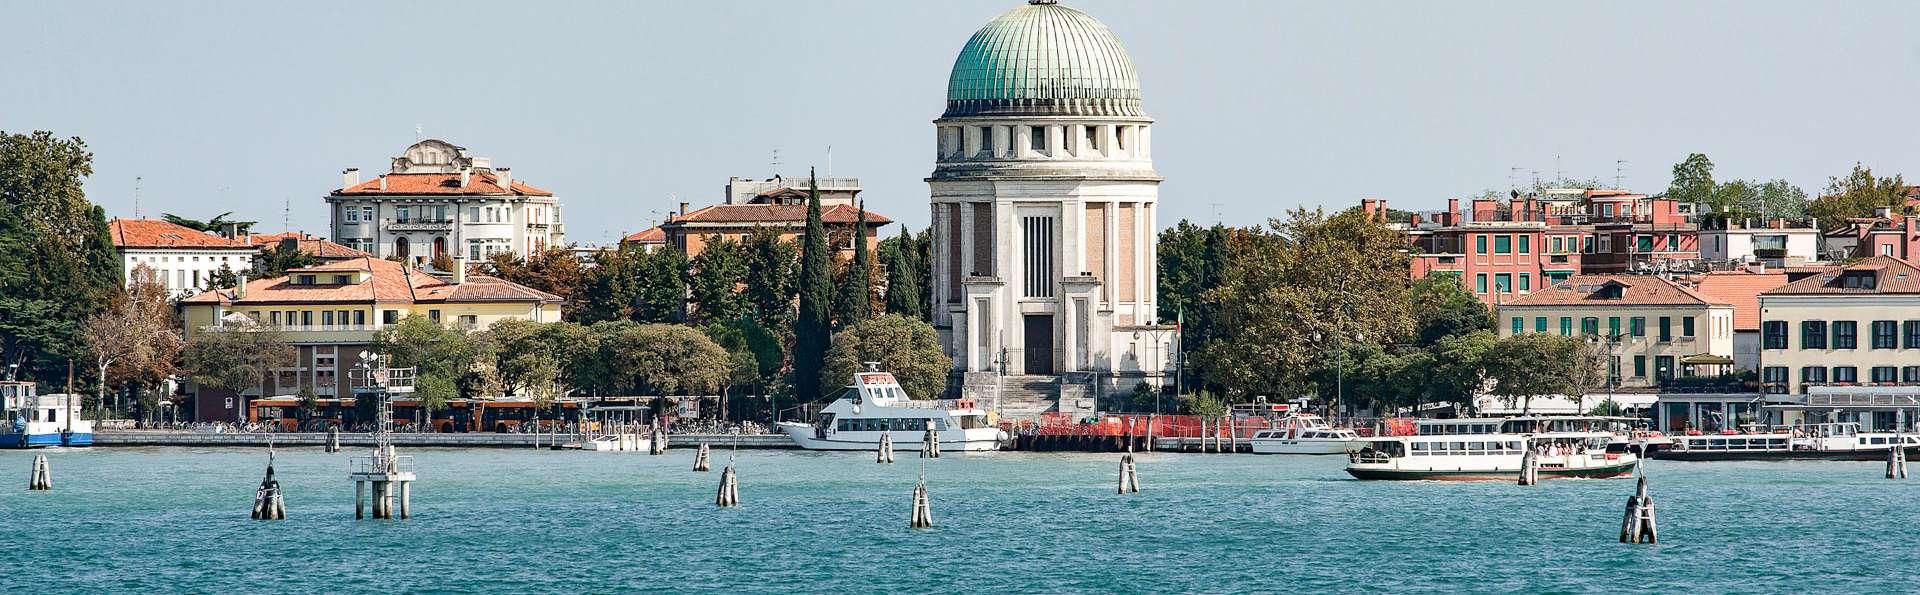 Staycity Aparthotel Venice Mestre - EDIT_LIDO_VENICE_01.jpg